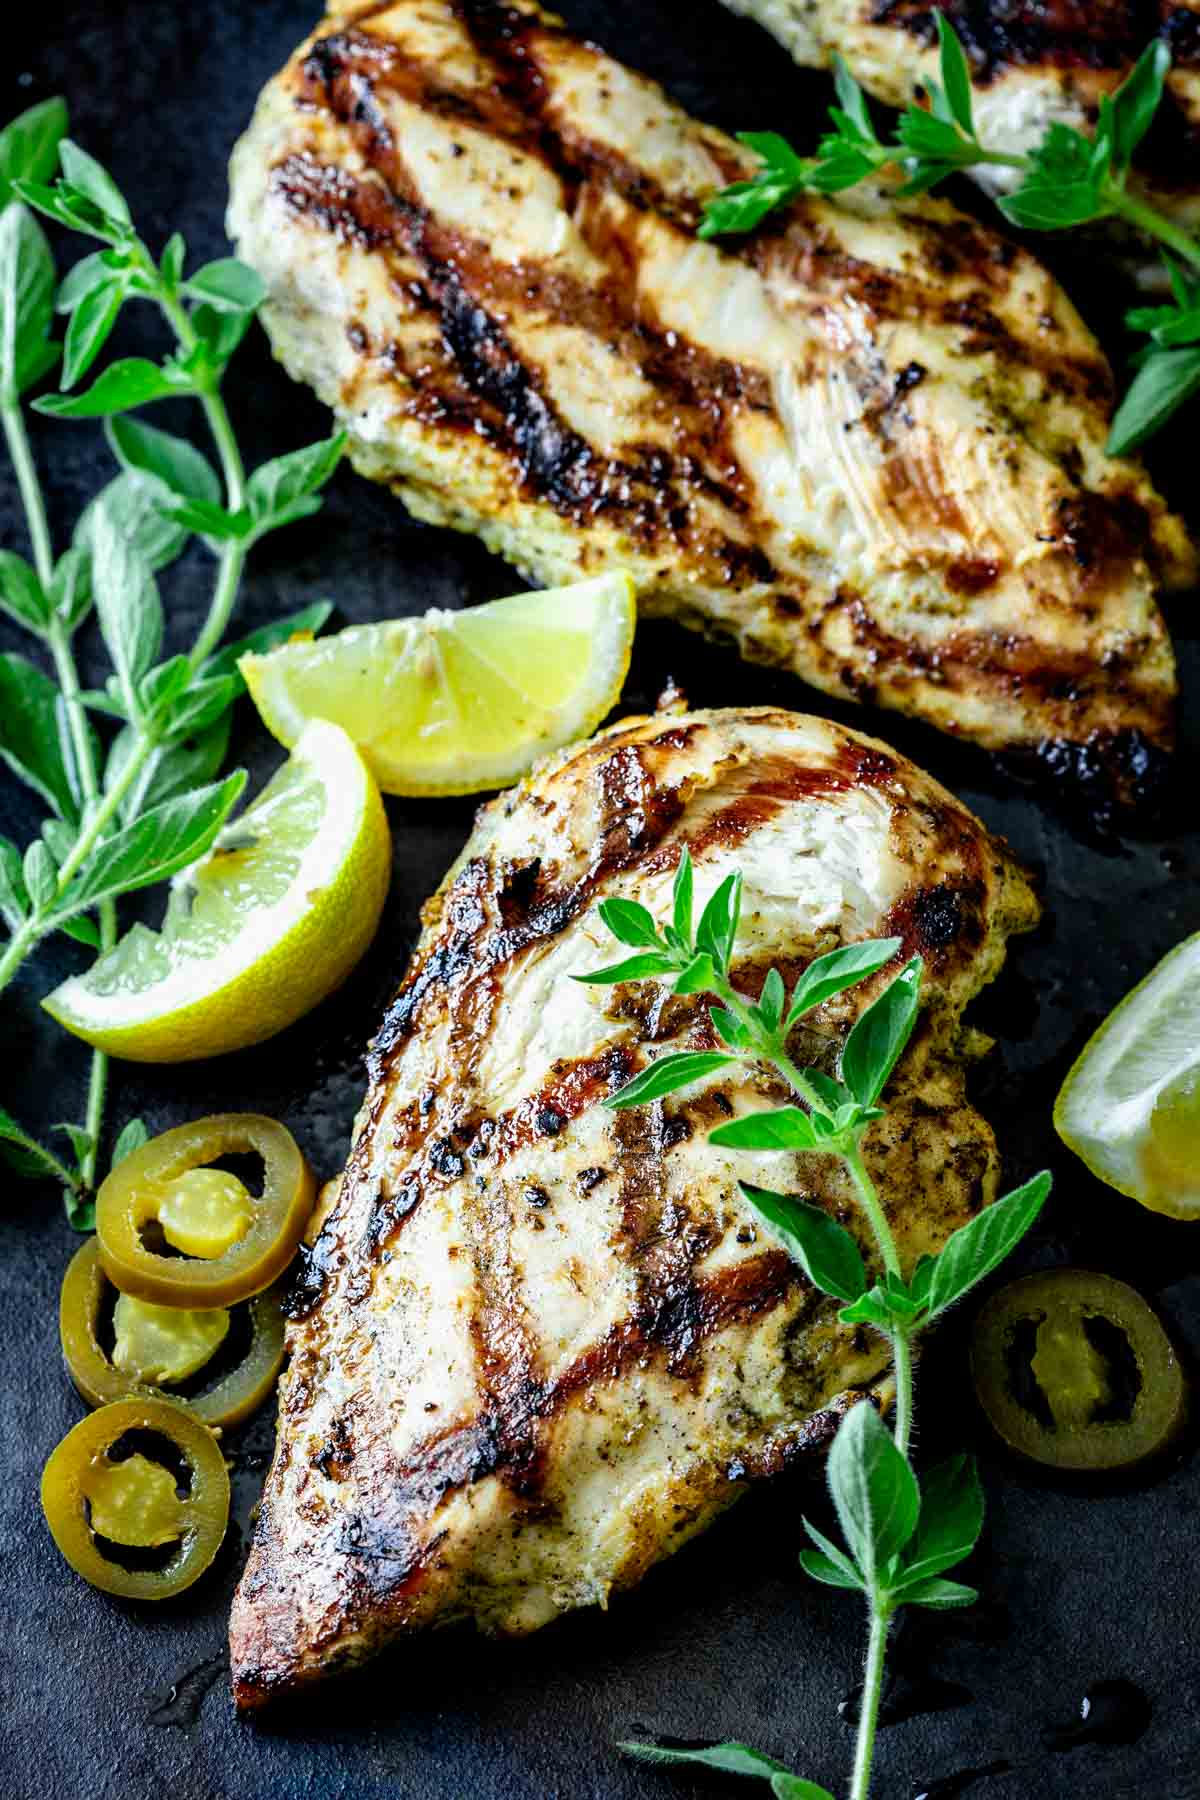 grilled chicken with oregano sprigs